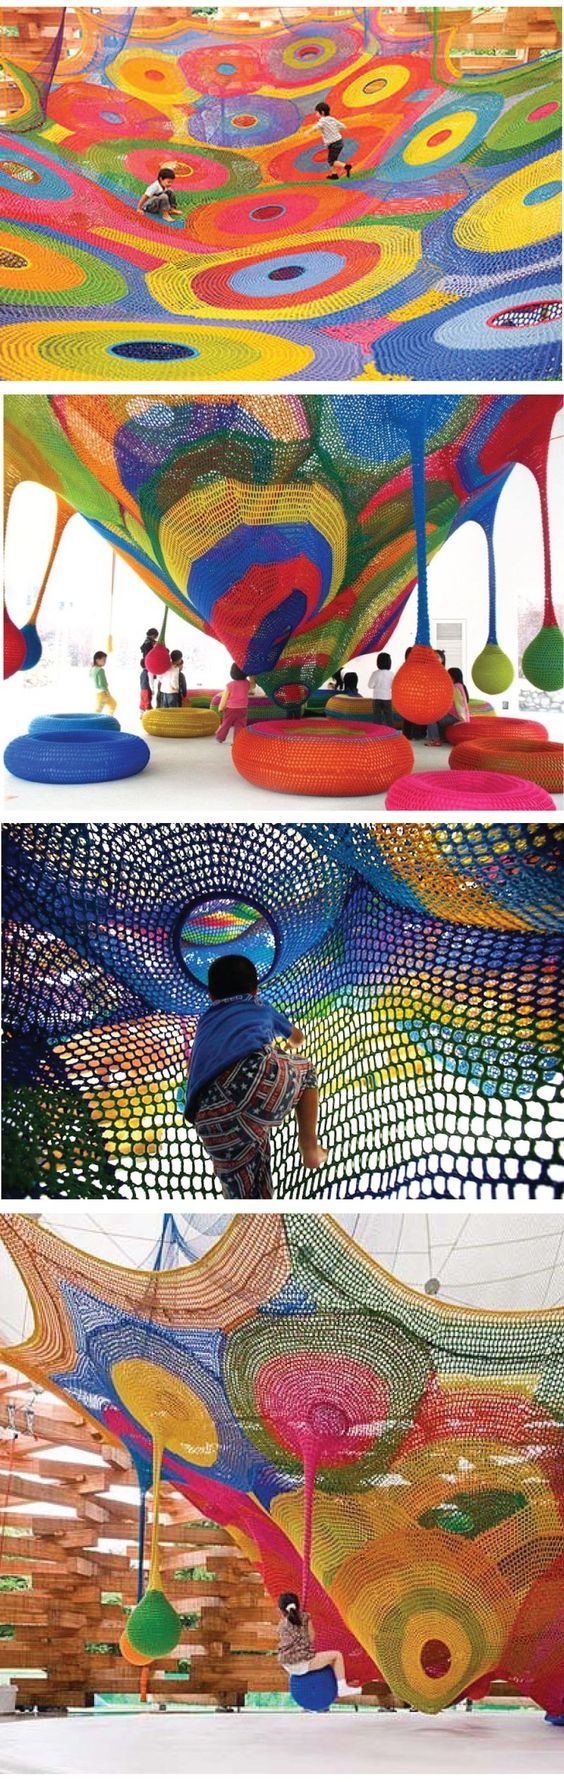 crochet play-gym anyone? :)